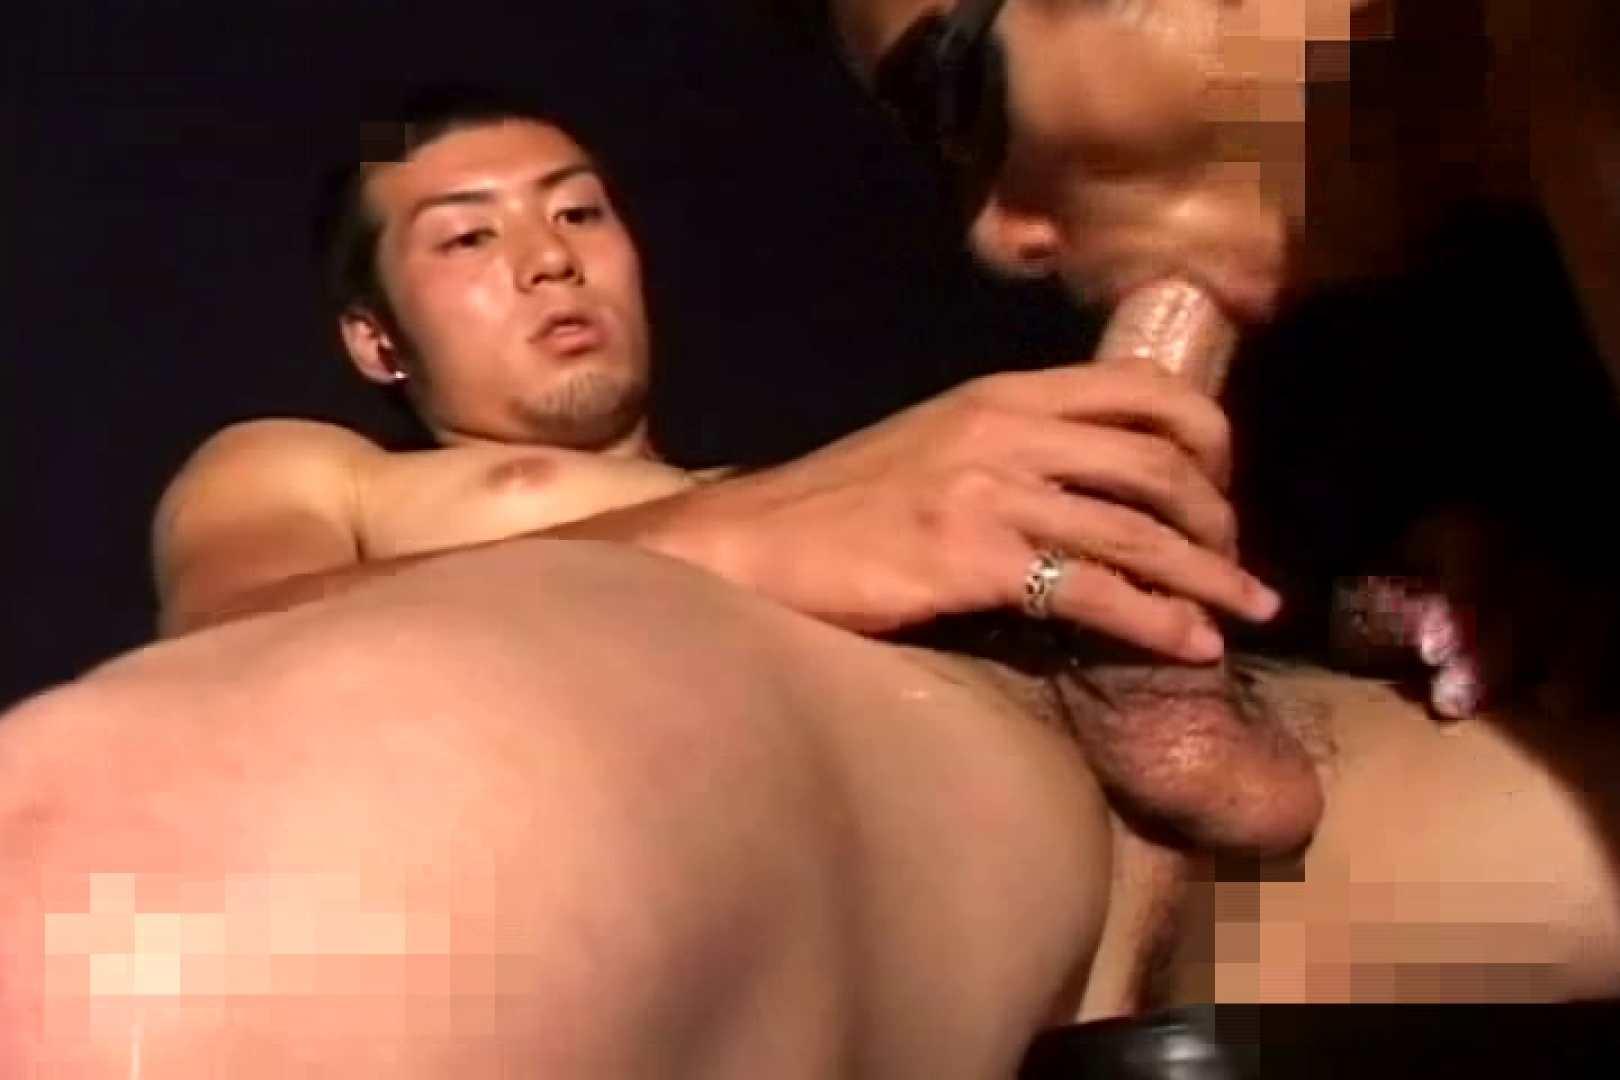 Beautiful muscle モッコリ野郎達!Vol.04 フェラDE絶頂 | イケメンのsex  103pic 95